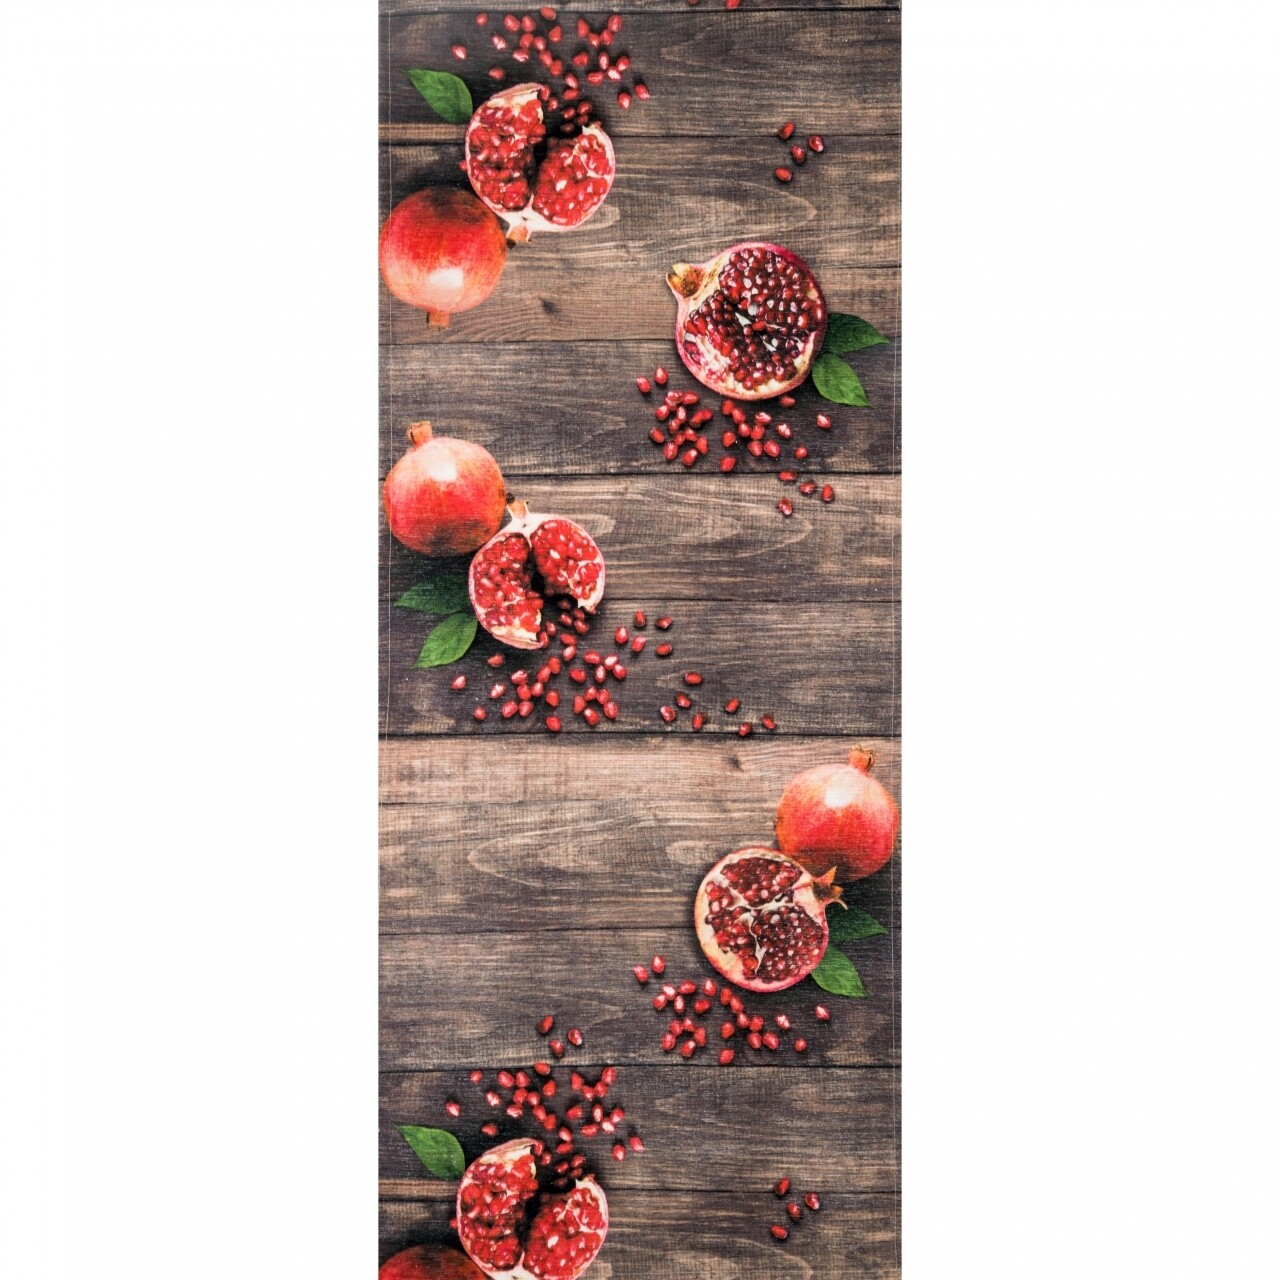 Covor rezistent Webtappeti MELOGRANA CM 58x190 cm, maro/rosu/verde